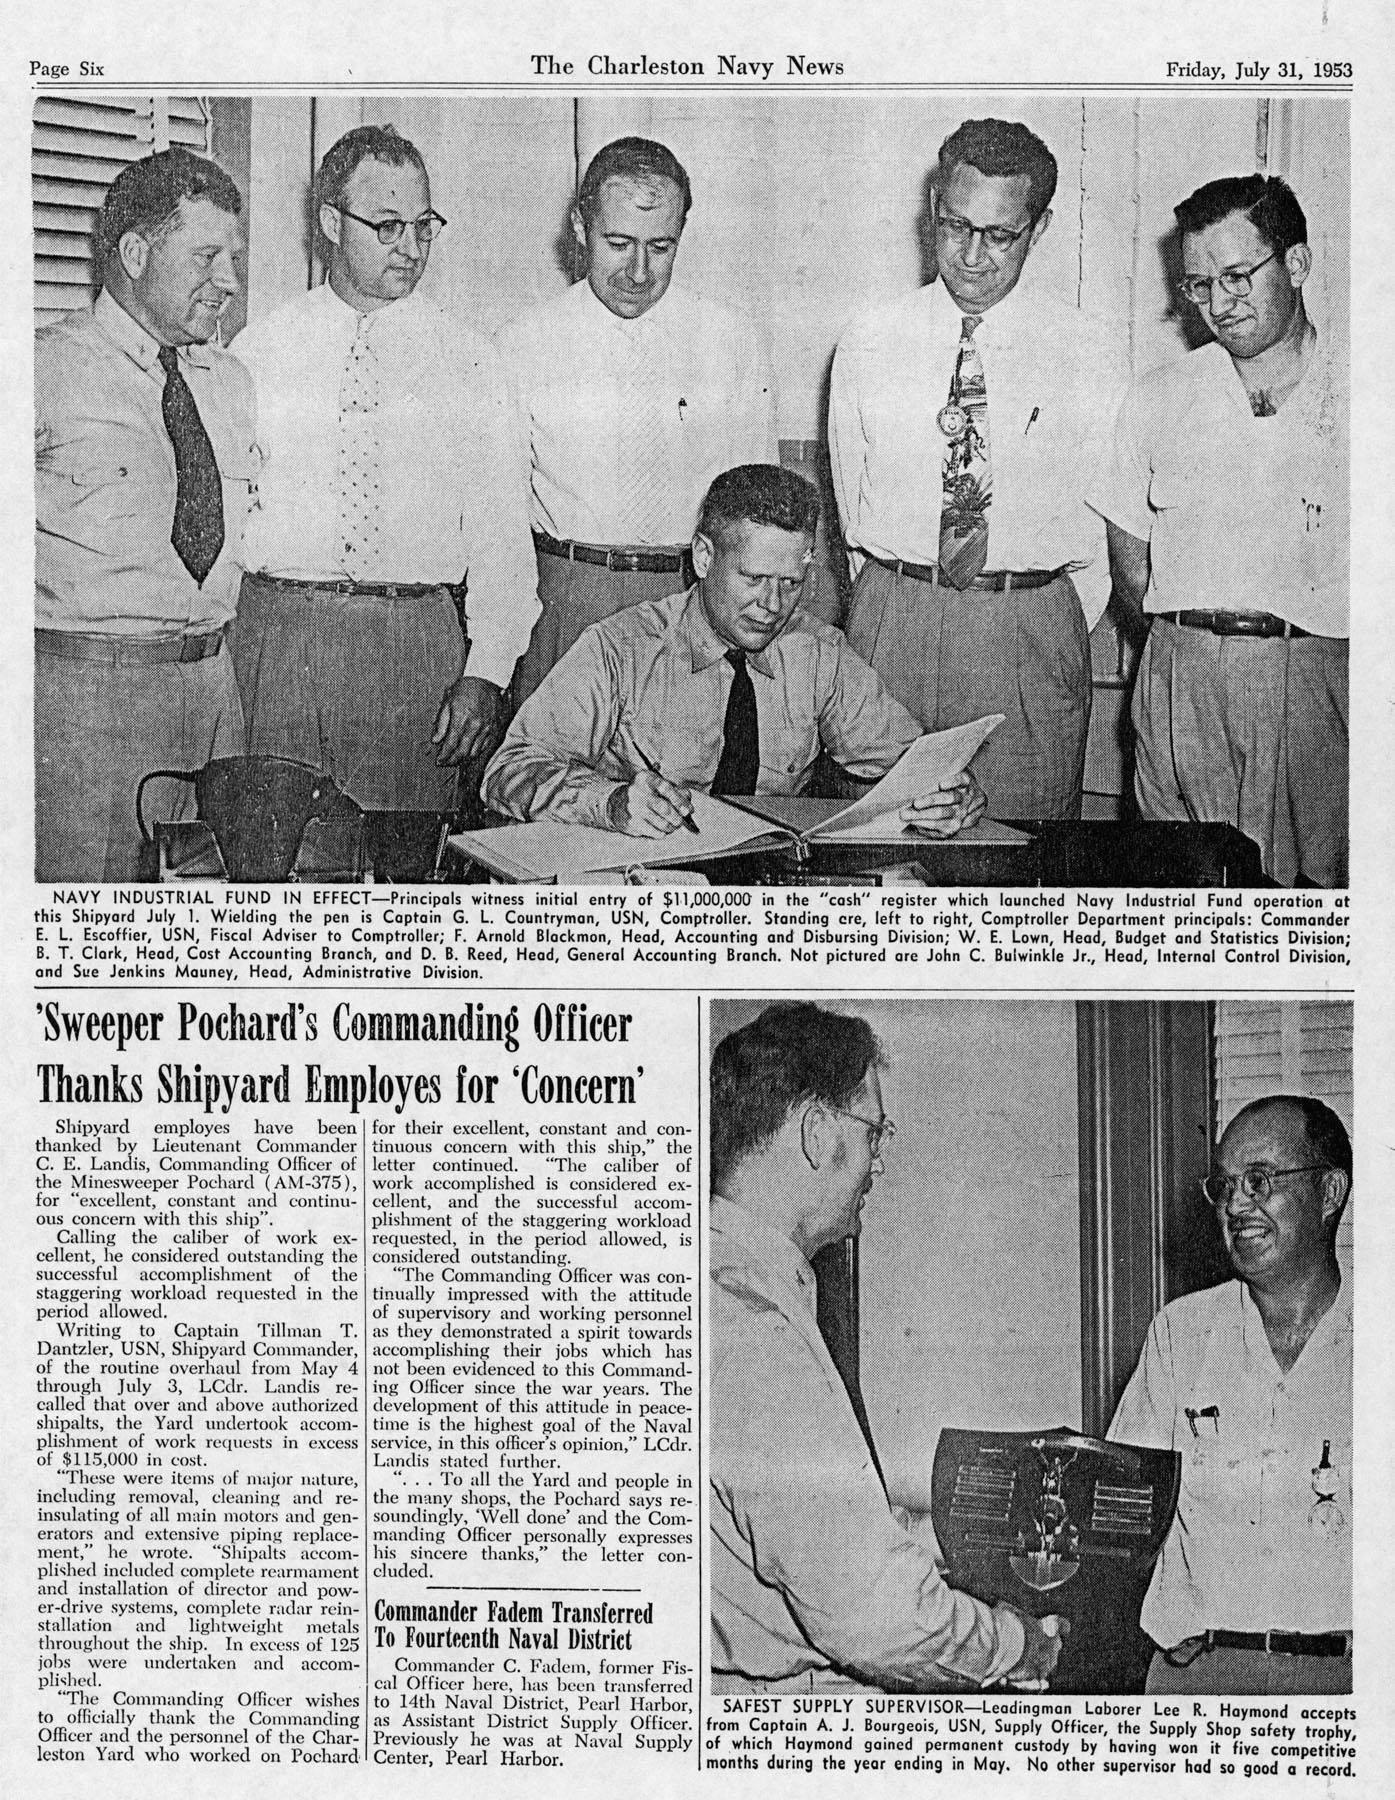 The Charleston Navy News, Volume 12, Edition 1, page vi